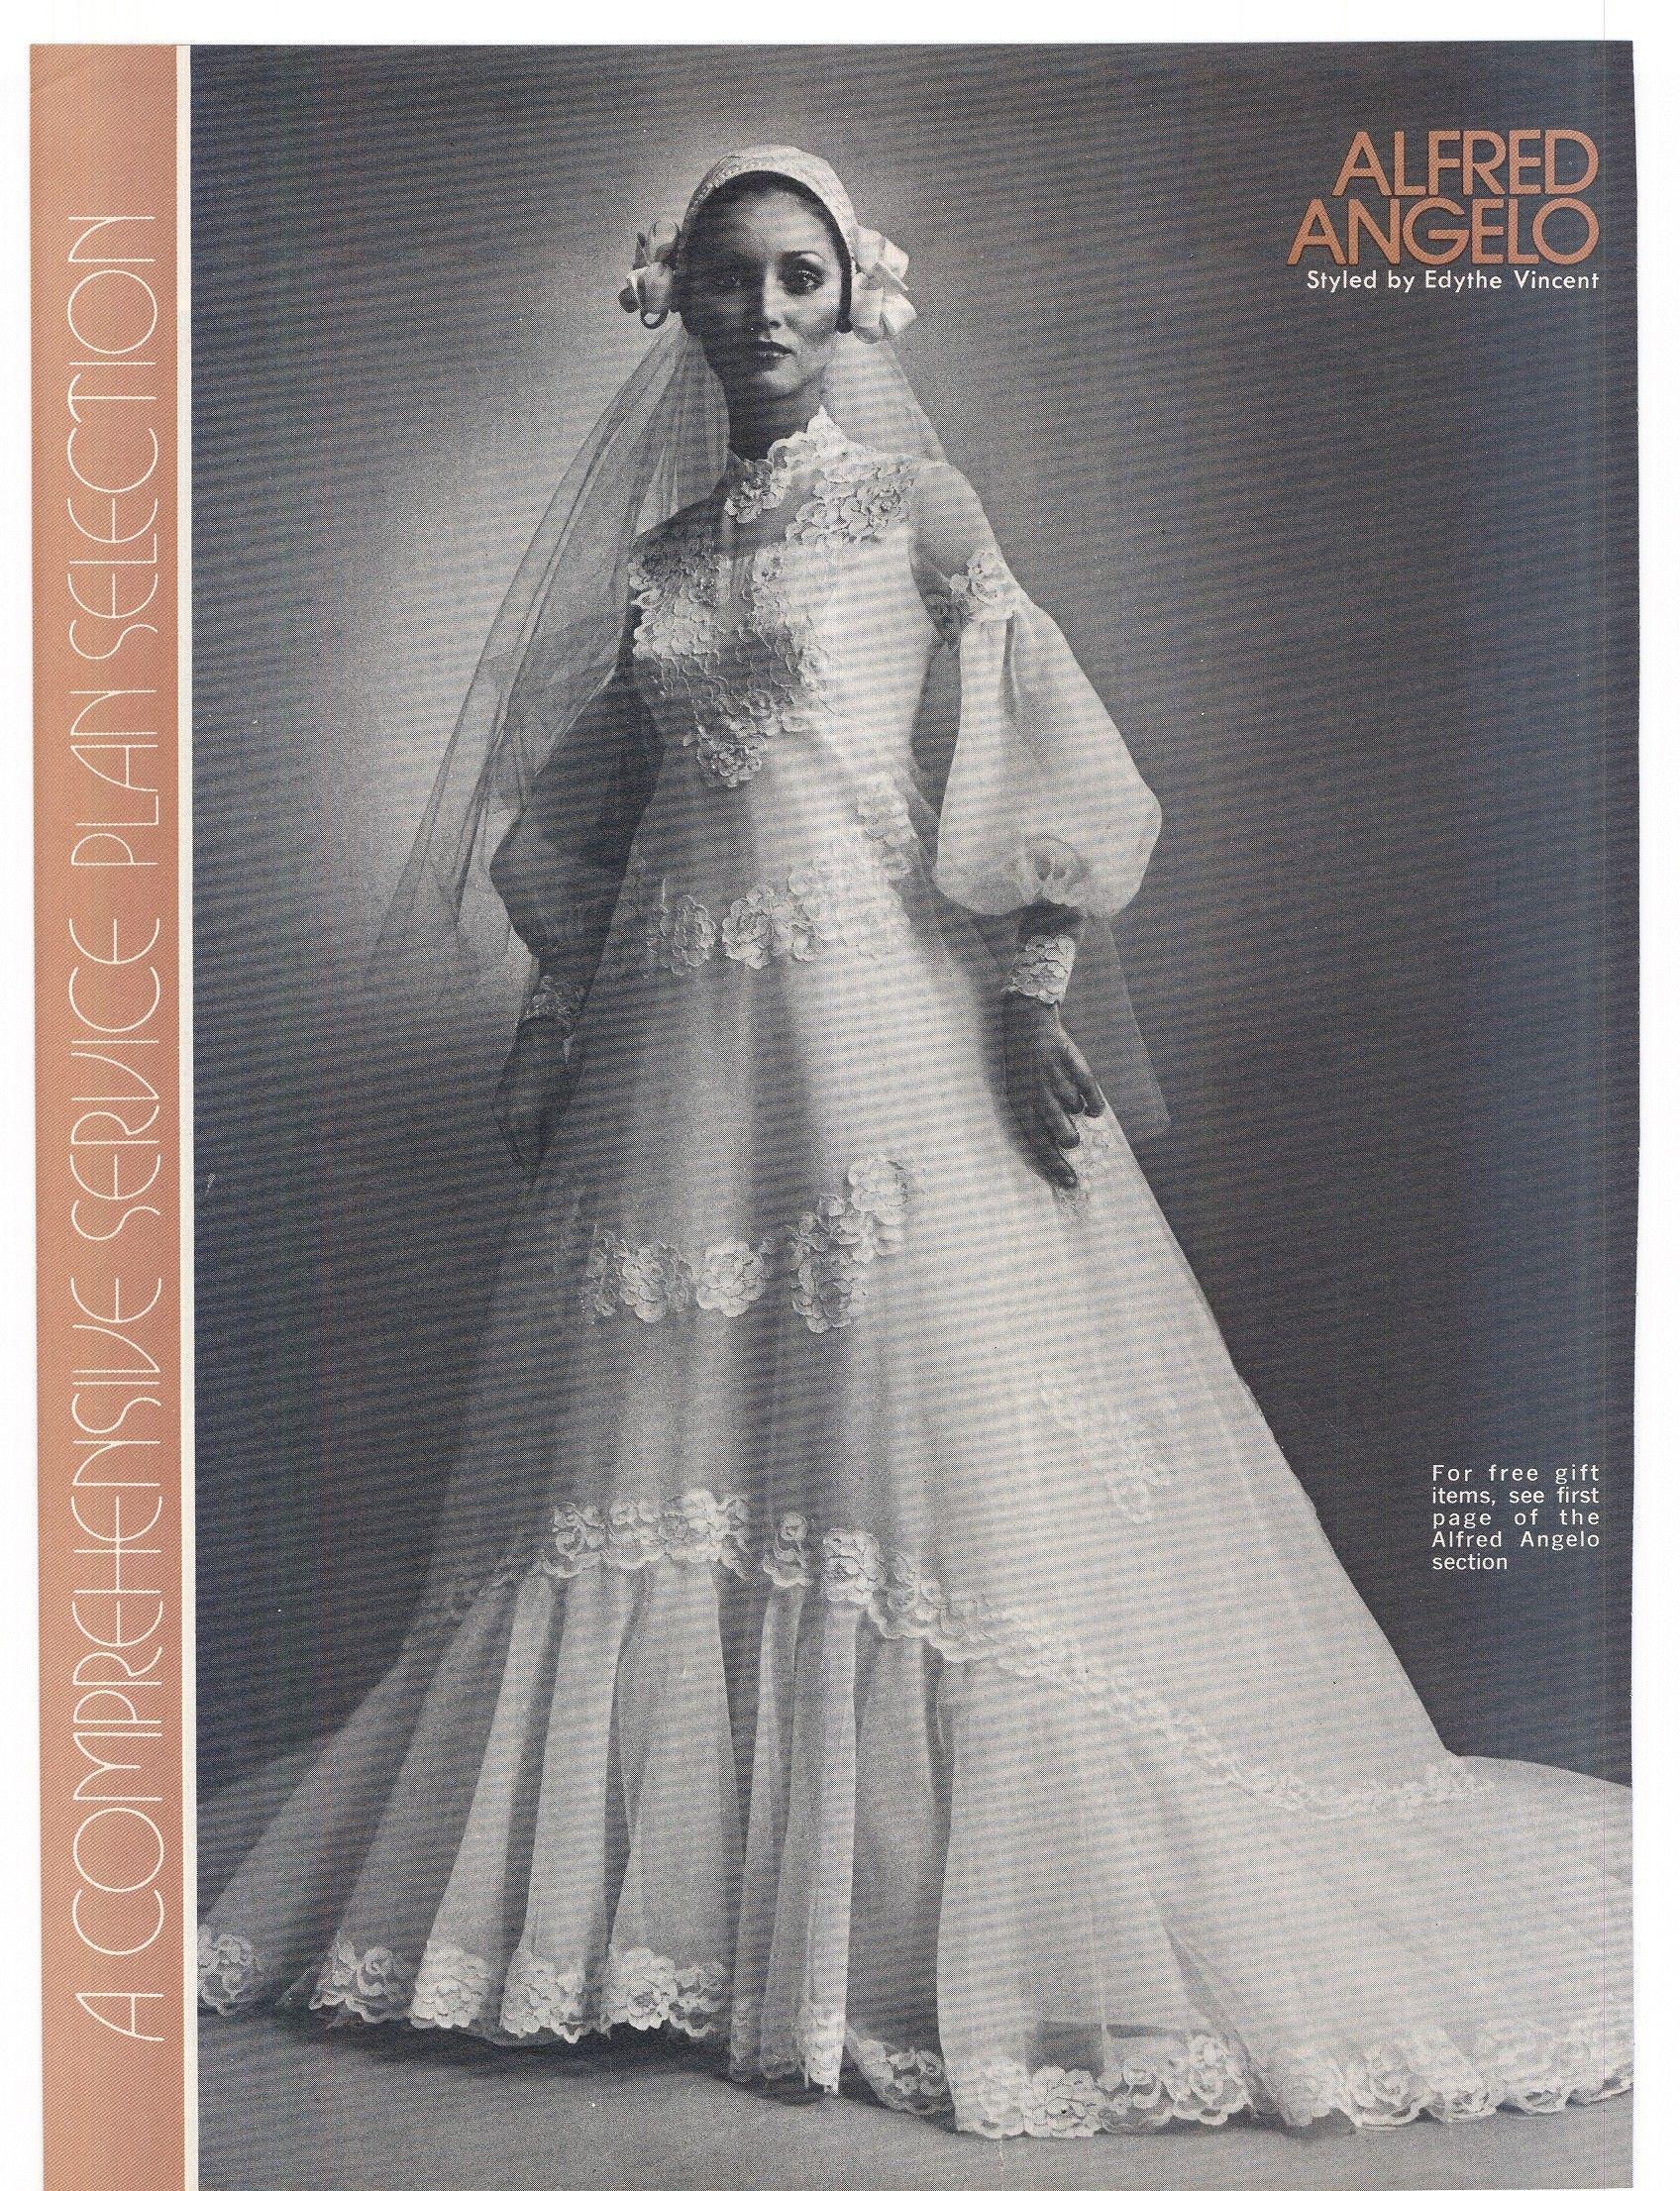 1975 Brides Magazine Bridal Dresses Vintage Vintage Bridal Fashion Wedding Gowns Vintage